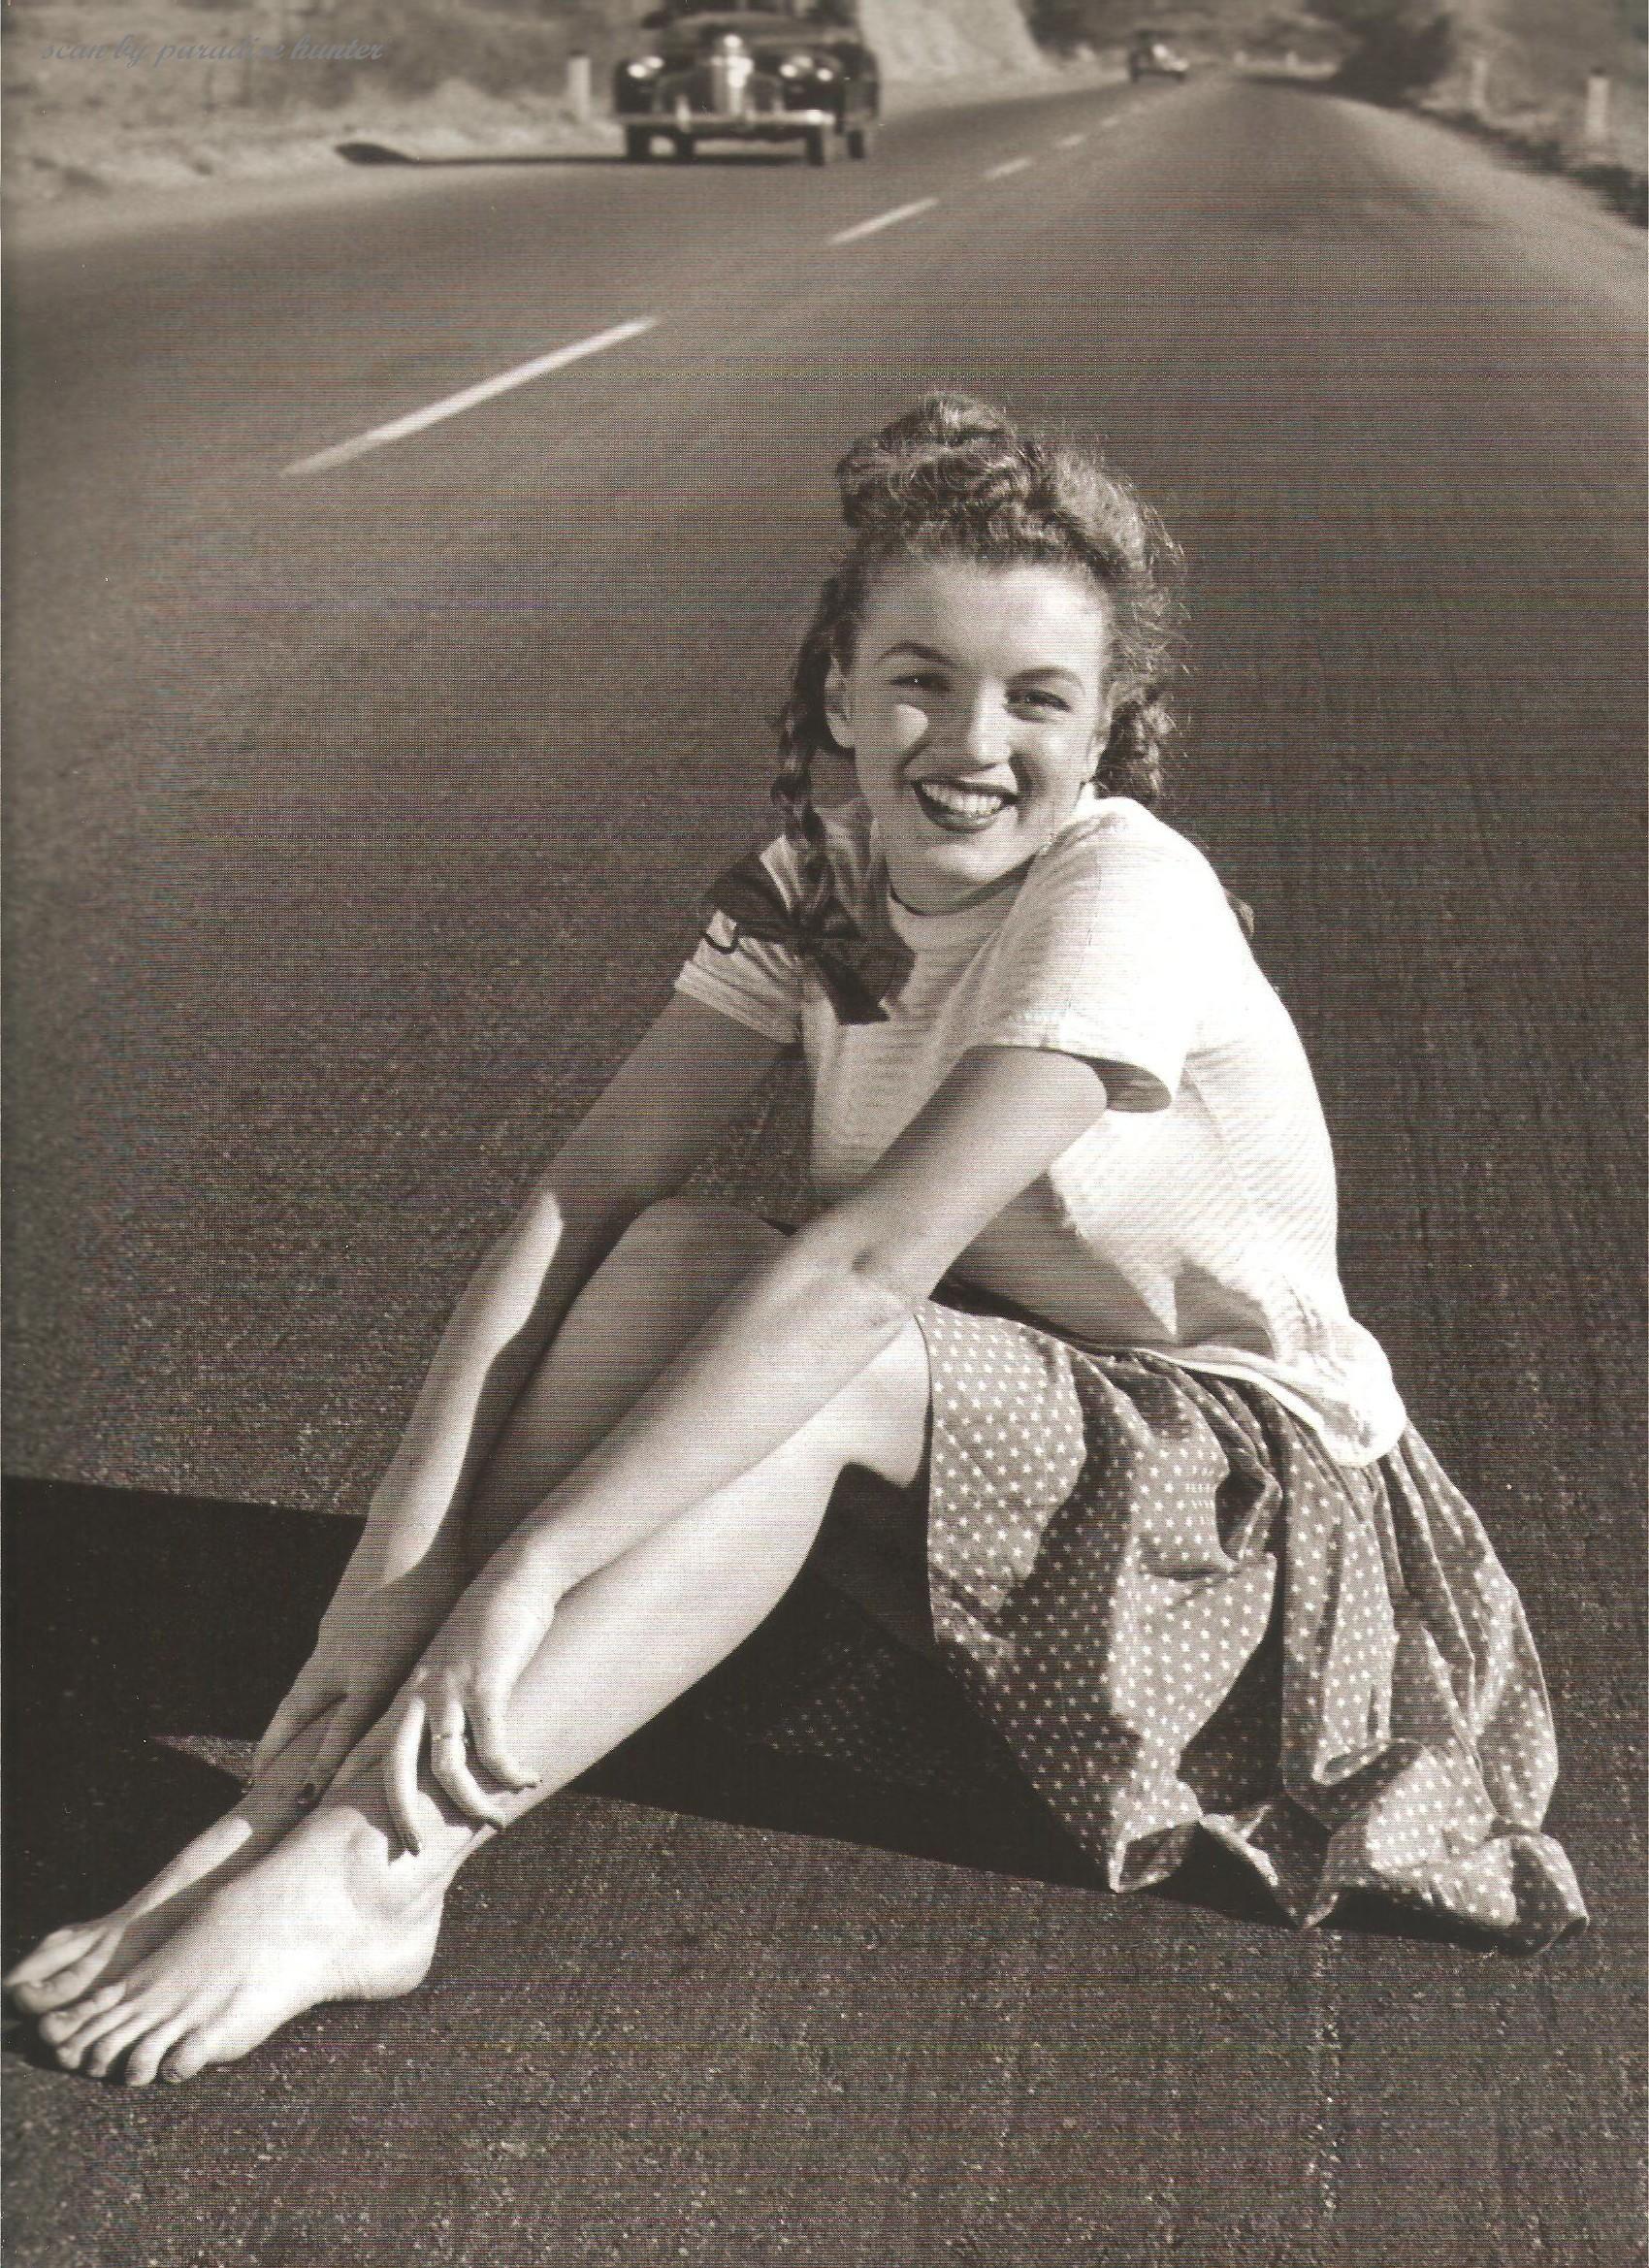 Marilyn Monroe by Andre De Dienes, 1945 Art marilyn